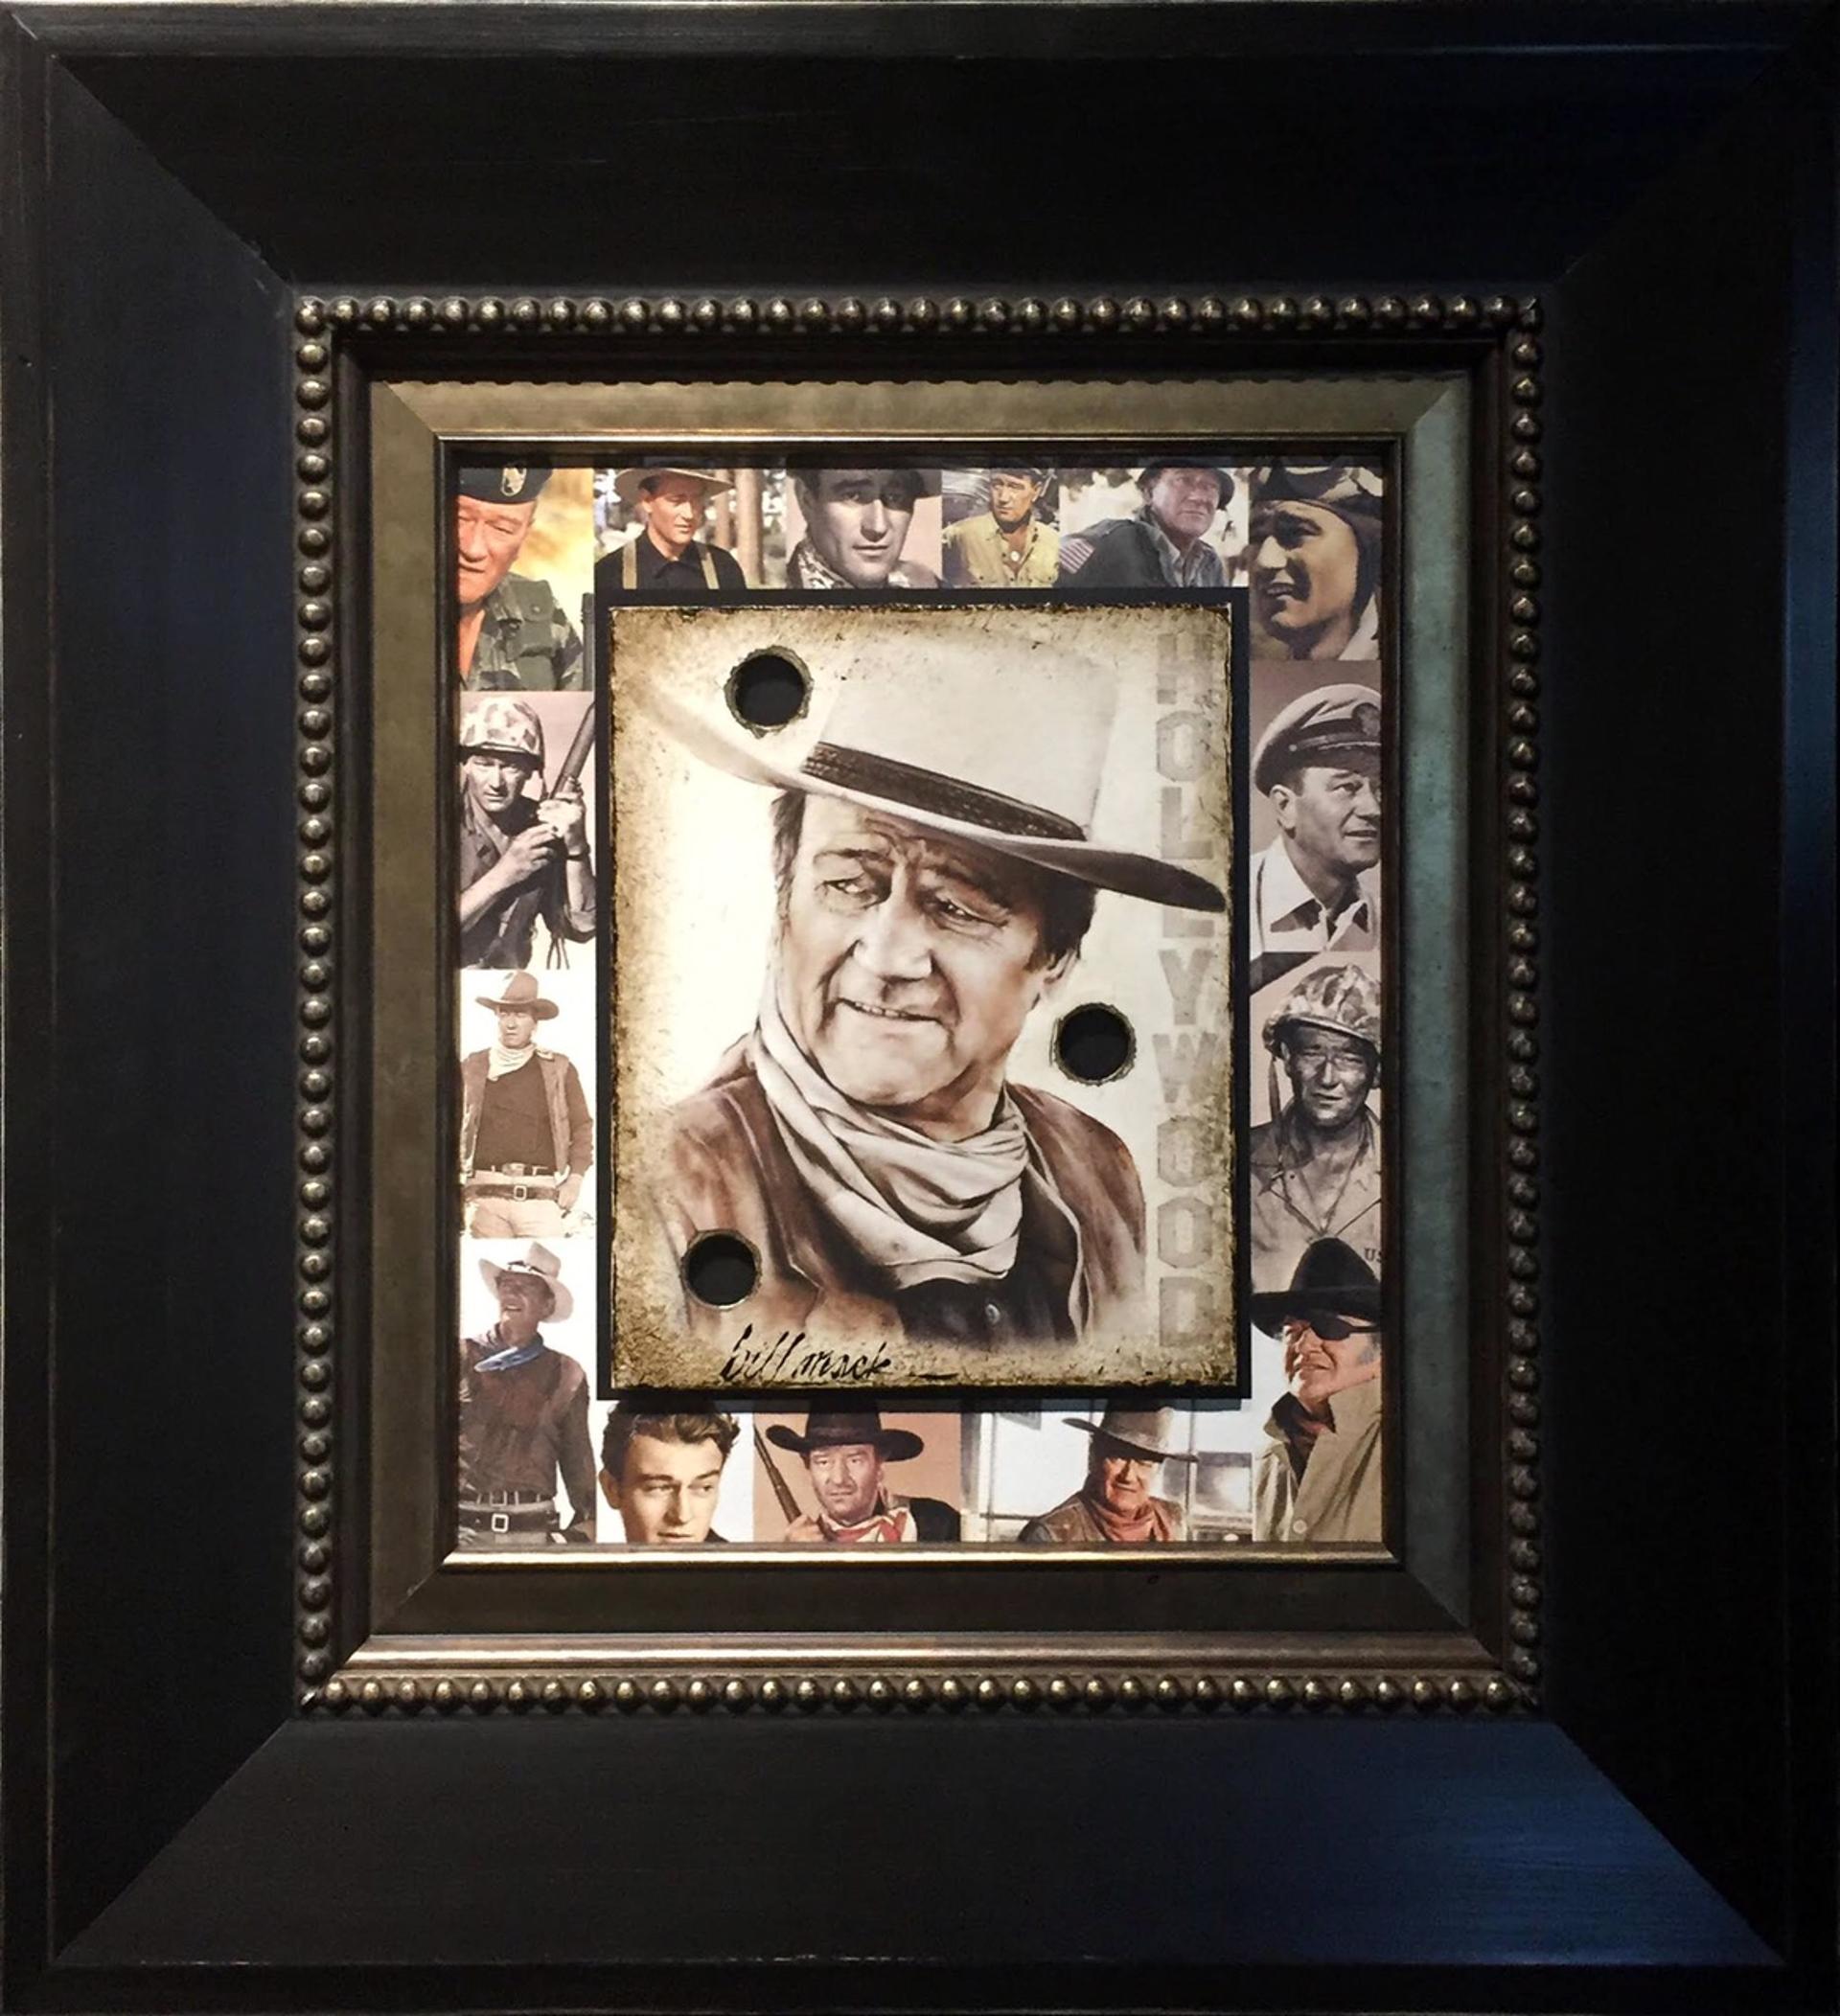 John Wayne - Ultimate Cowboy by Bill Mack